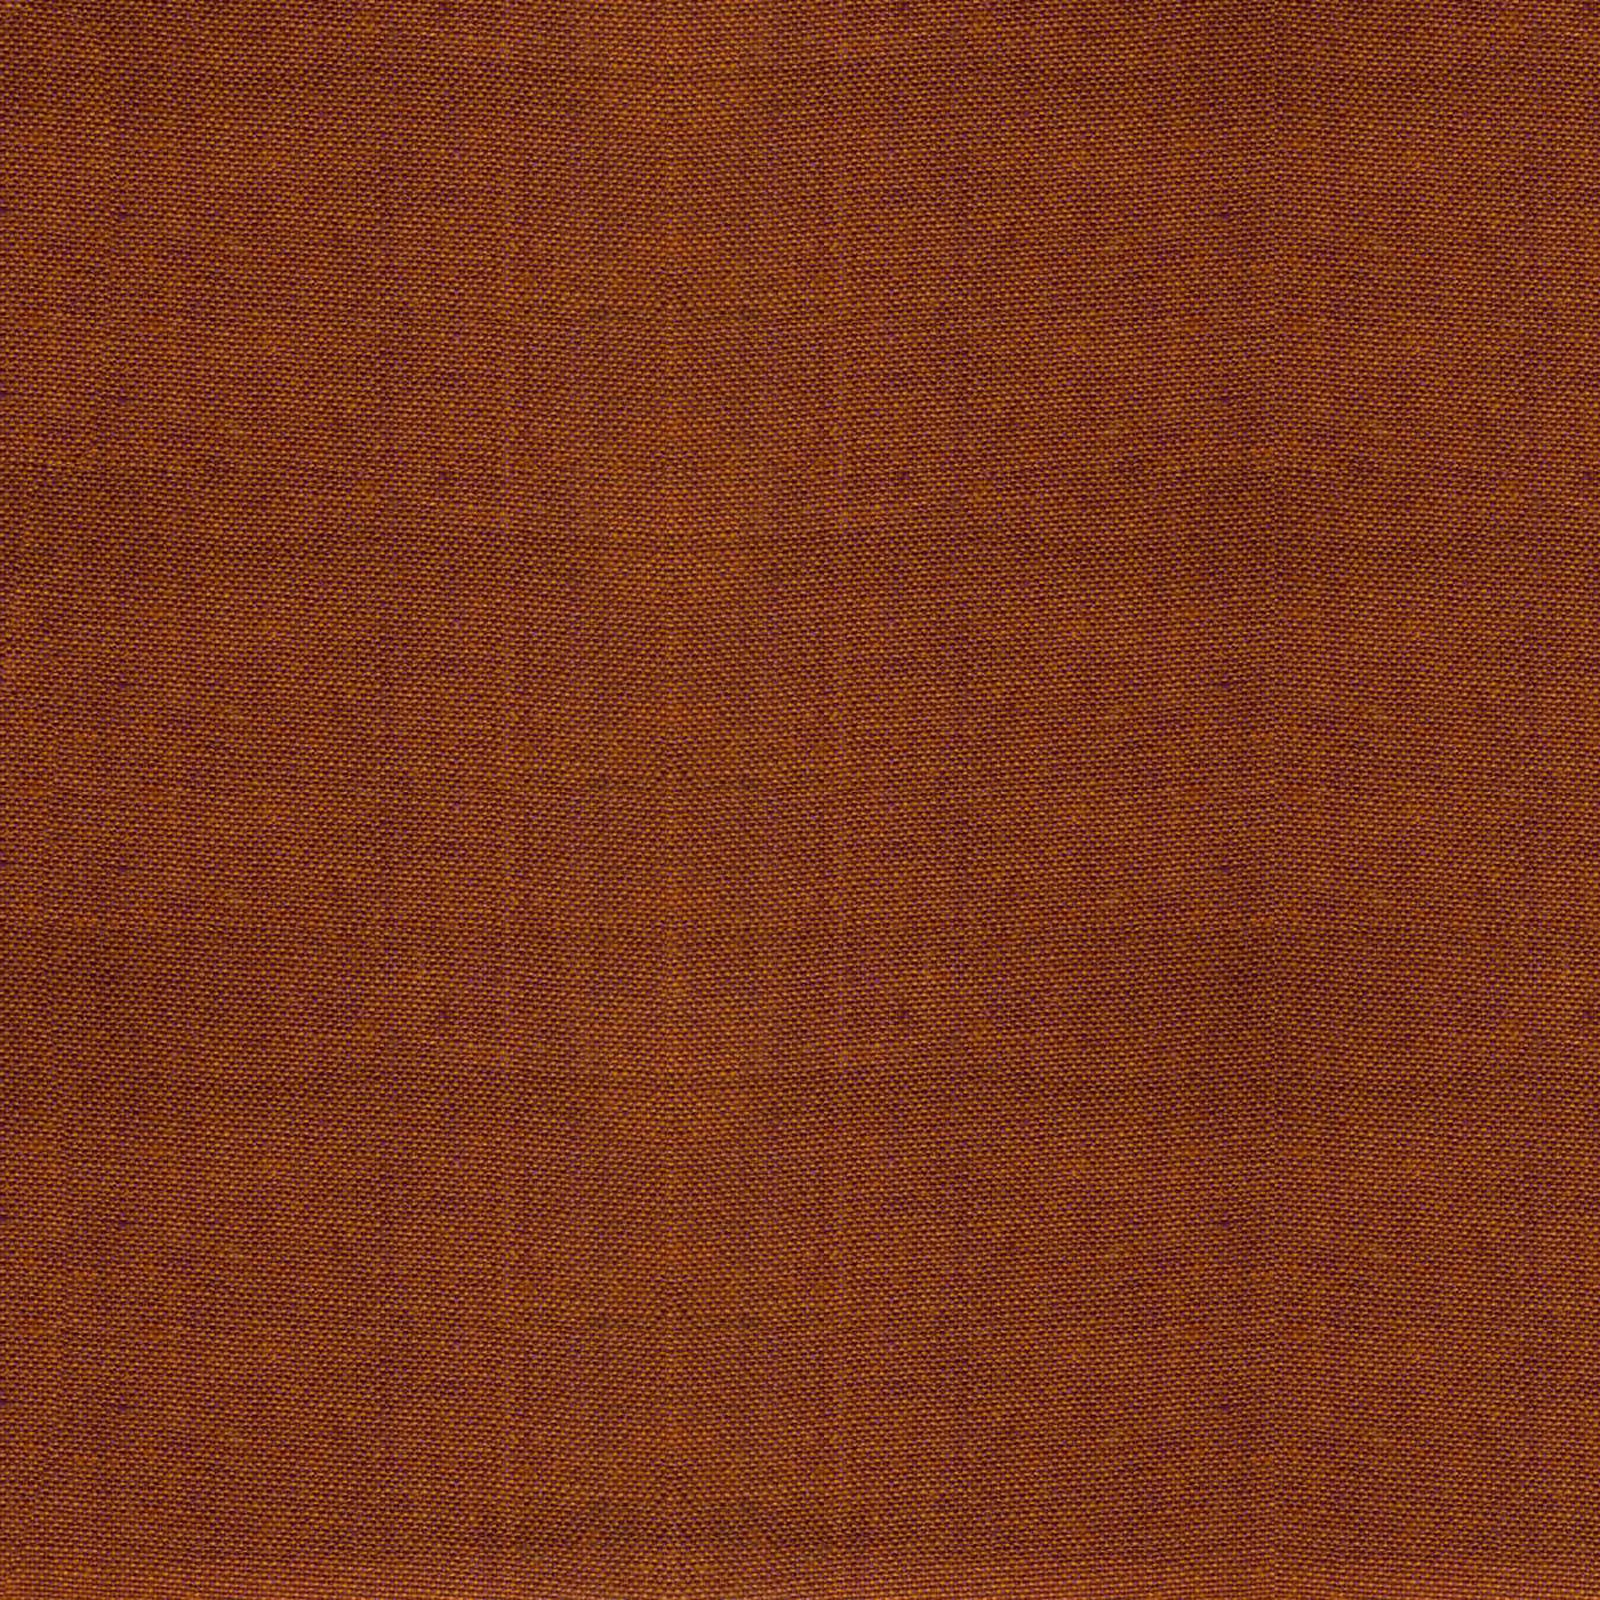 Luminary - Burnt Orange 23001<br/>Textile Creations